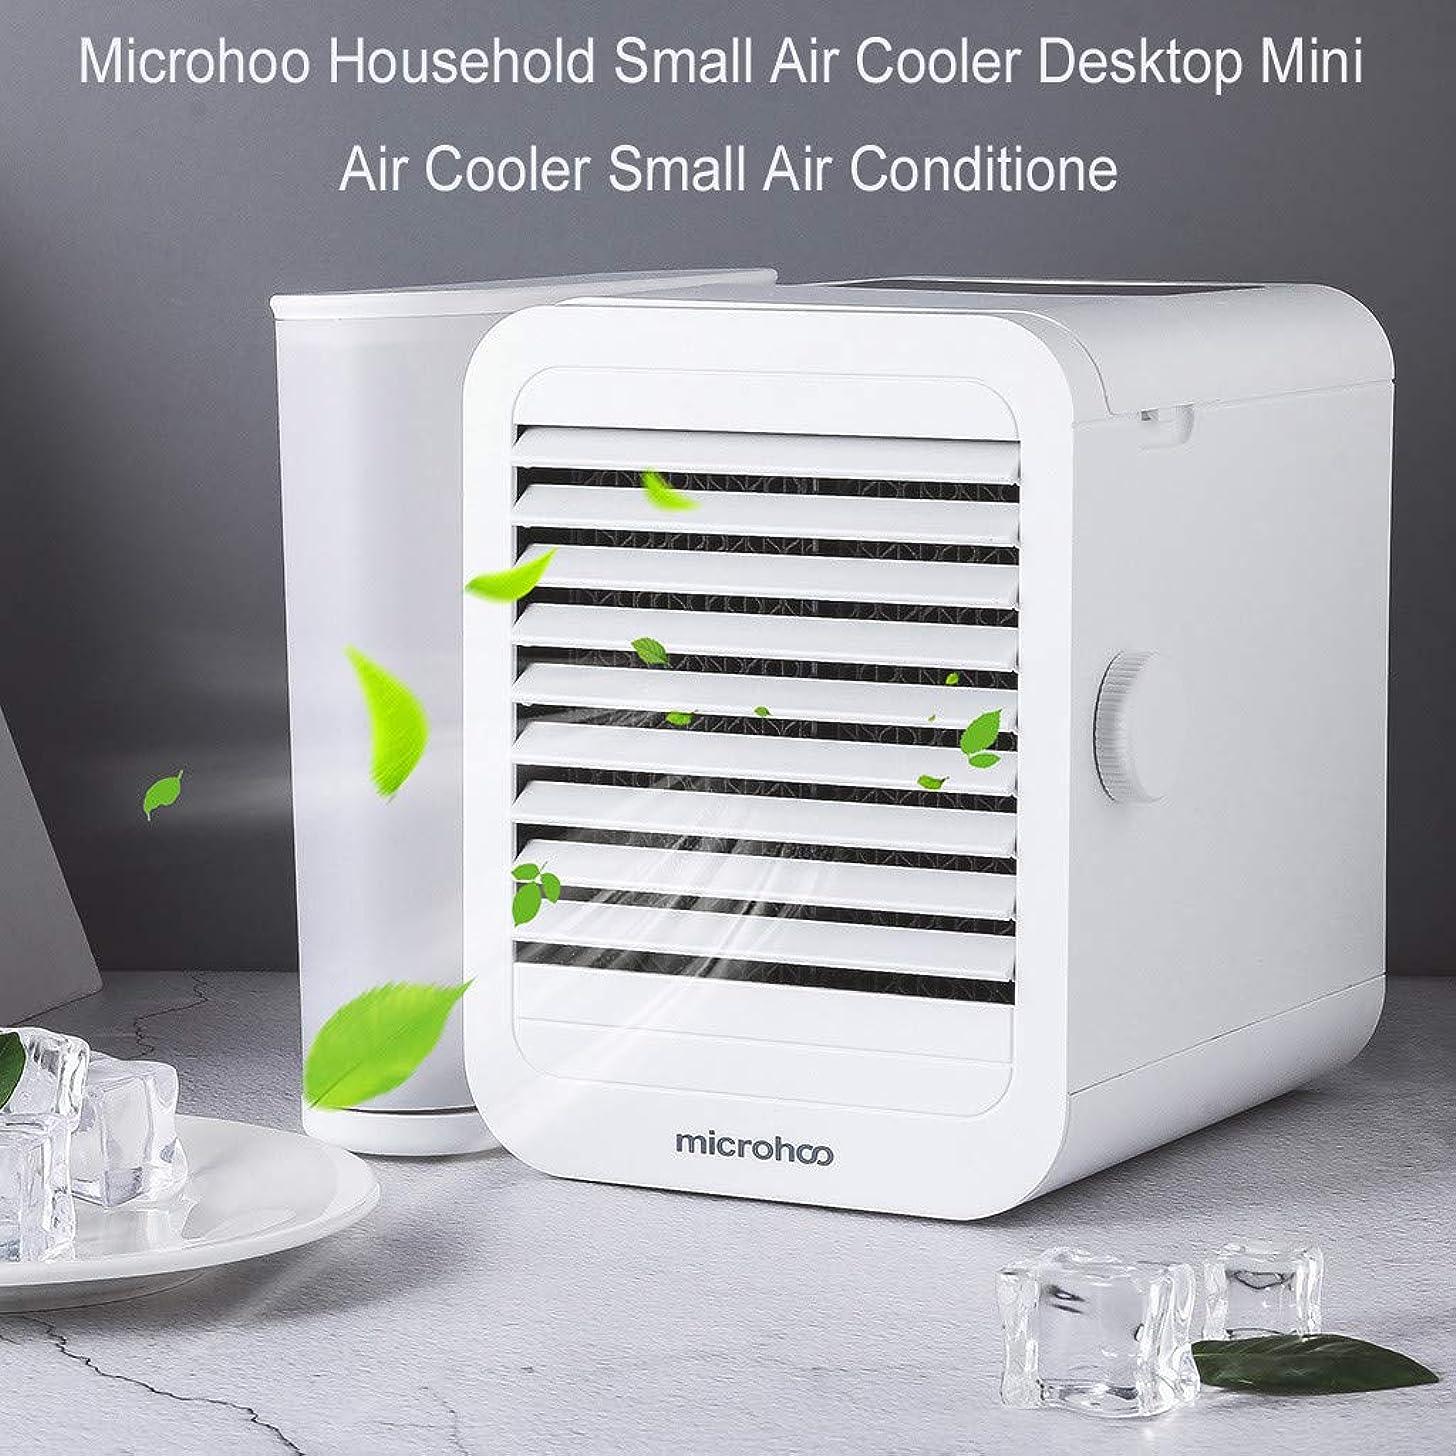 Personal Air Conditioner Fan Portable Air Cooler Blower Noiseless Mini Desktop Humidifier Purifier 3-in-1 Fan for Bedroom Office Travel | 3 Gear Speed | USB adapter | 1000ml